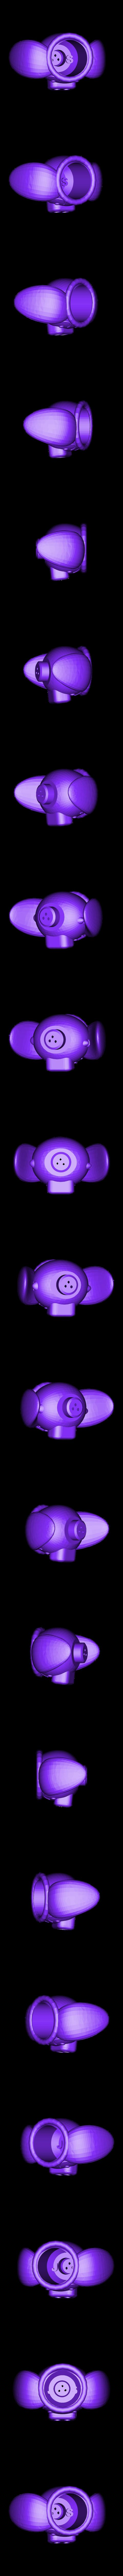 pink- pig-head.stl Download free STL file Cute animal - Rose pig potted • 3D printing object, mingshiuan